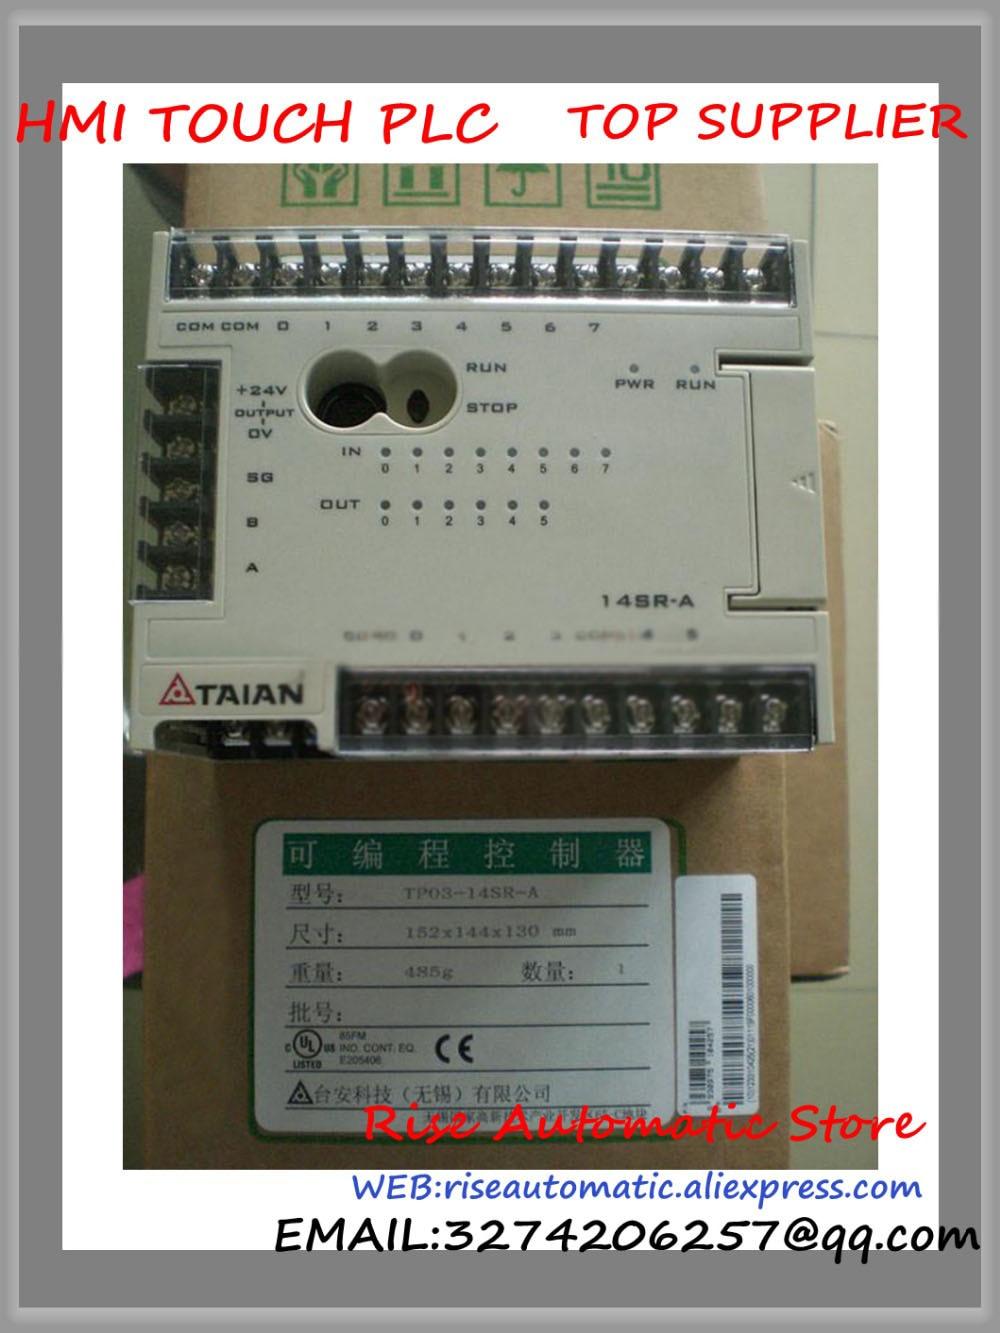 New Original PLC Programmable Logic Controller TP03-14SR-A PLC 100-240VAC 24VDC 8 input Relay 6 output 1 COM new original programmable logic controller module fx3g 14mr plc 100 240vac main unit